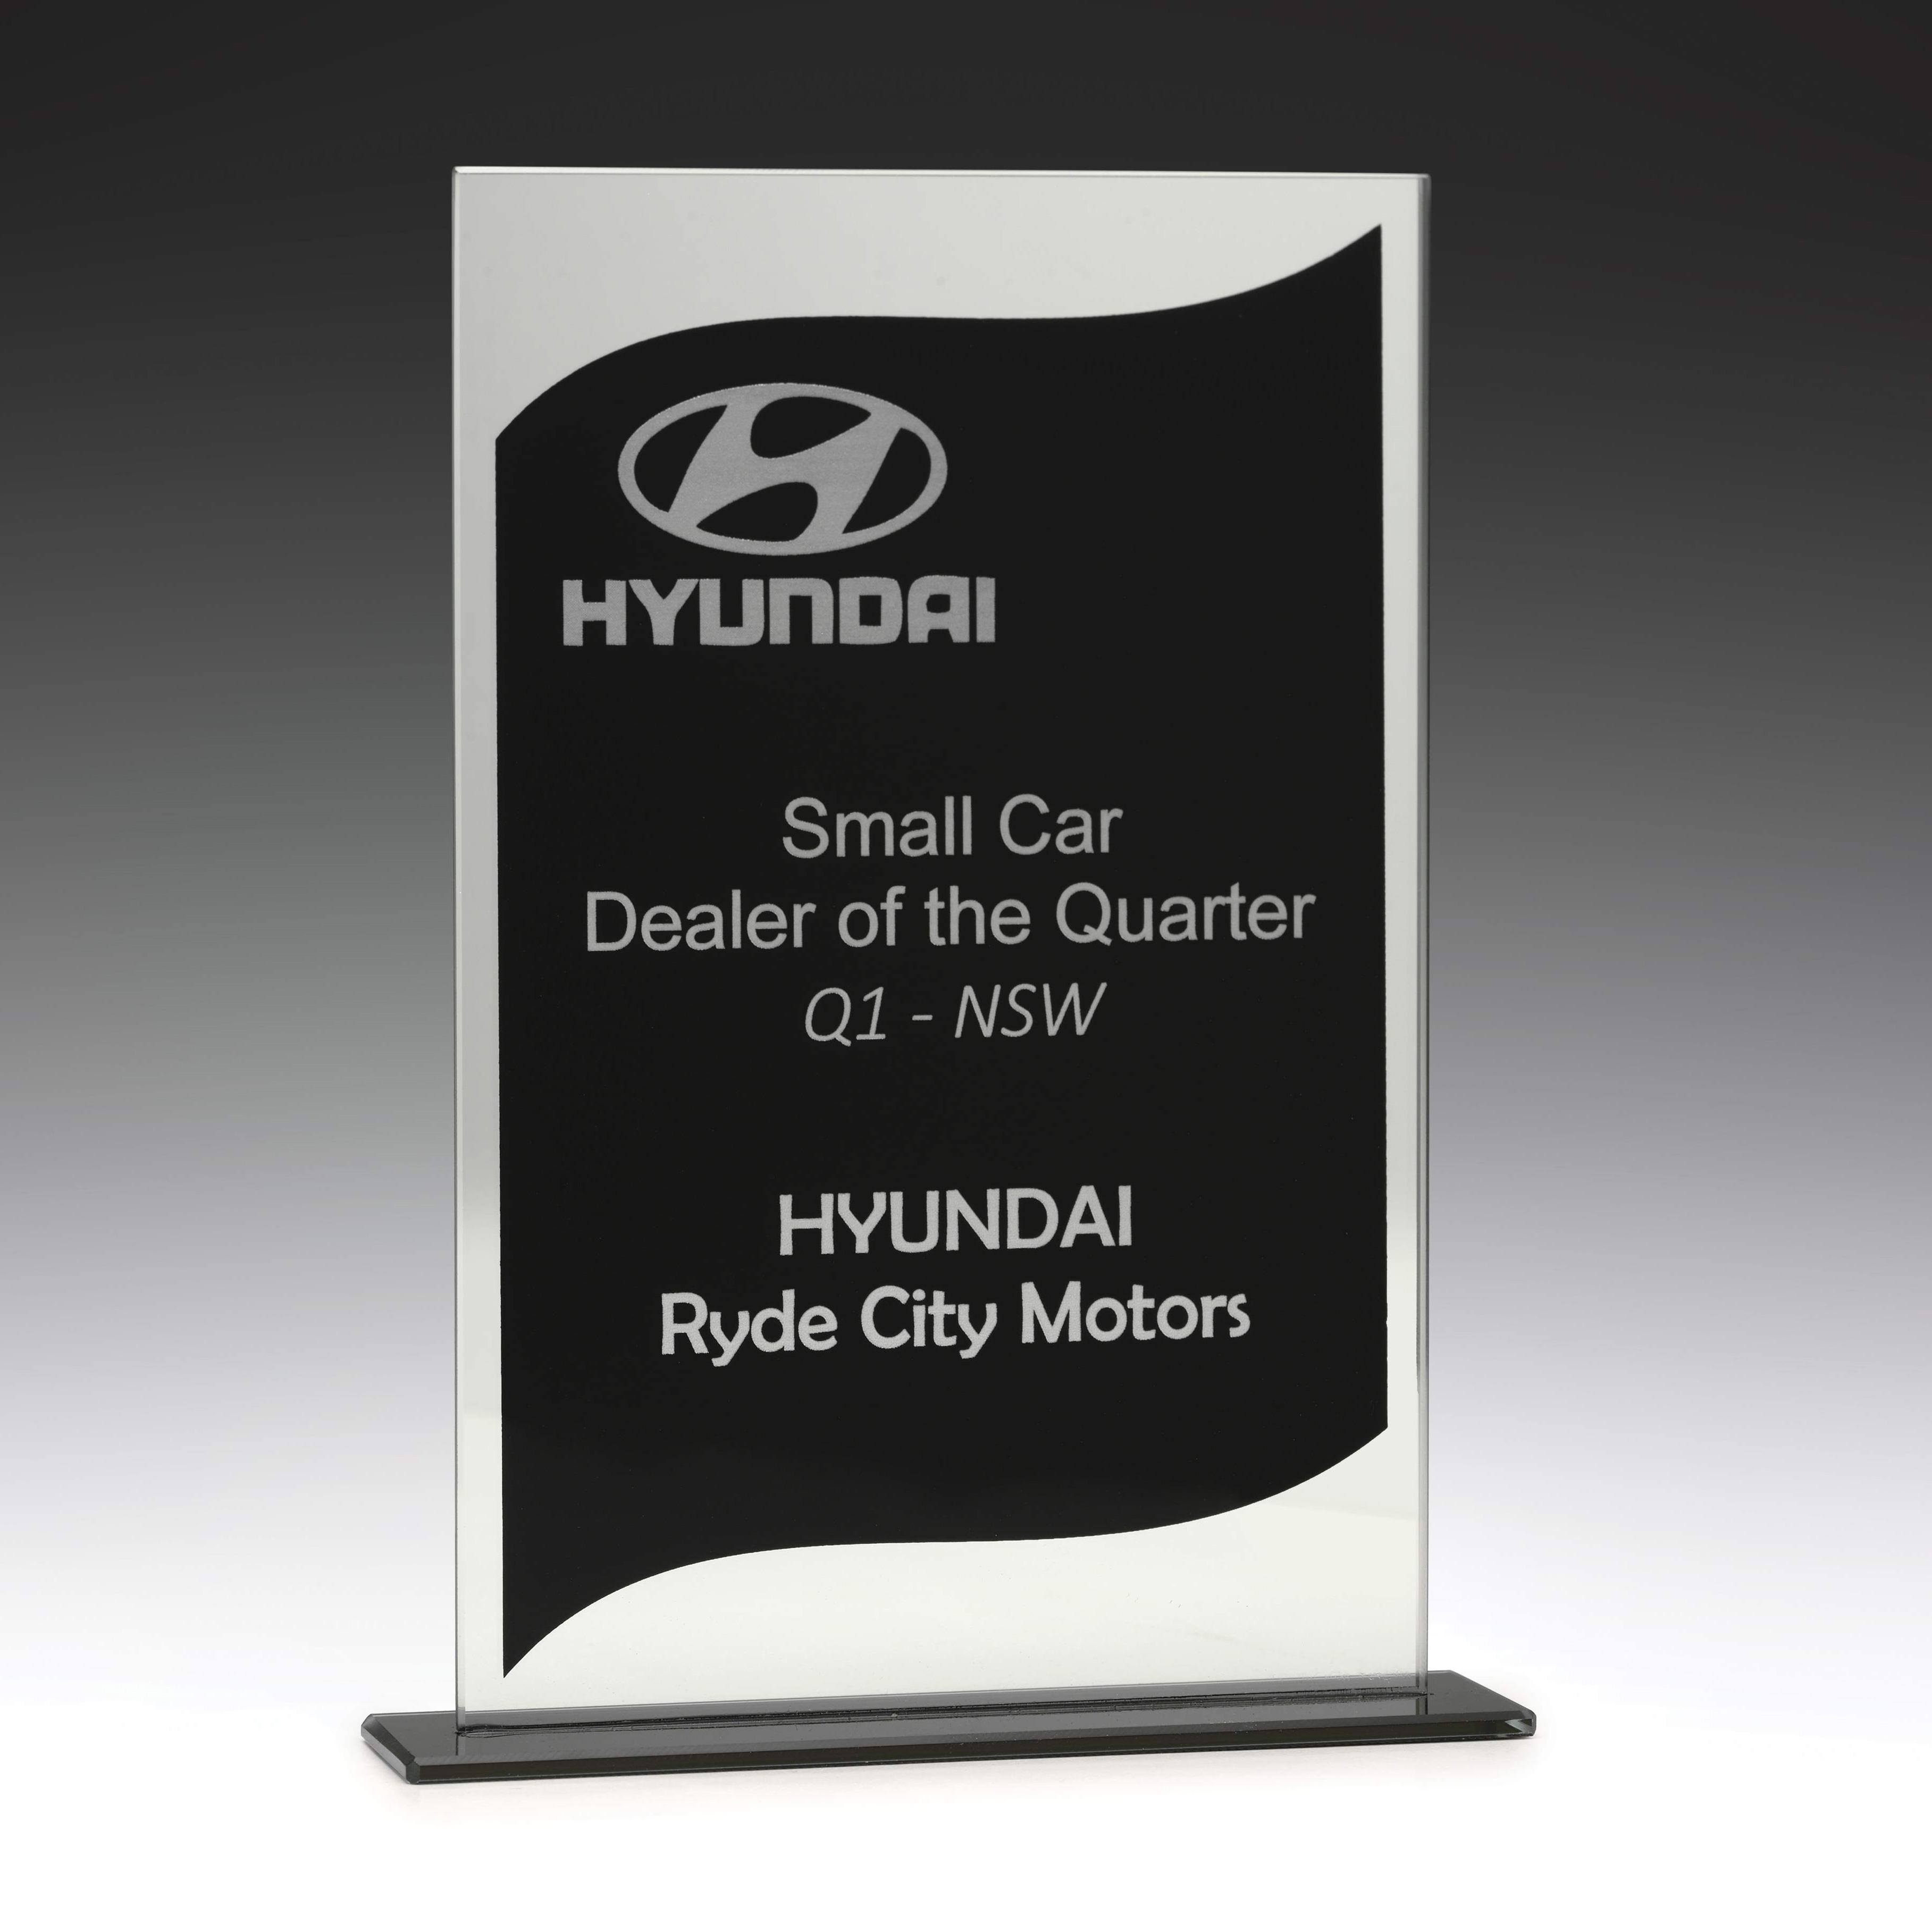 Glass Value Mirror Award